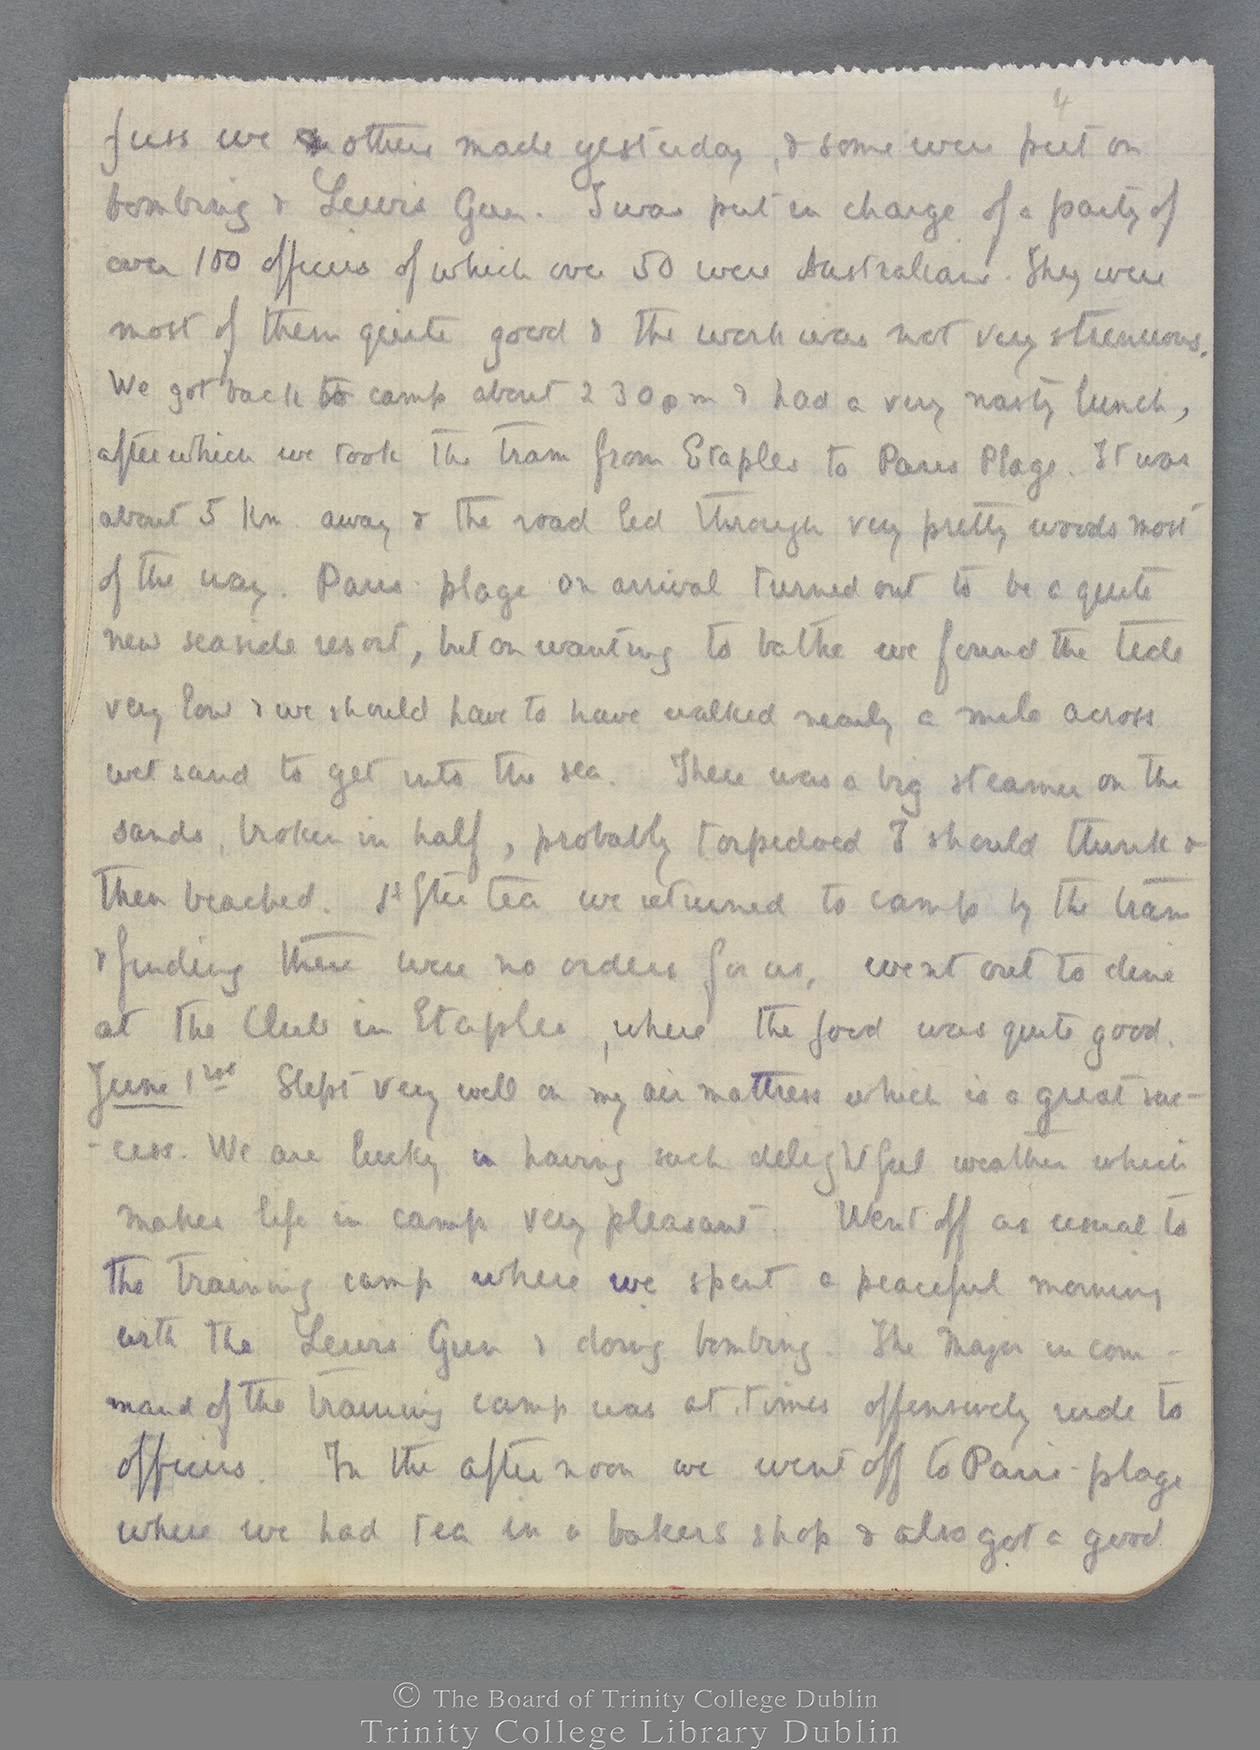 TCD MS 10821 folio 4 recto